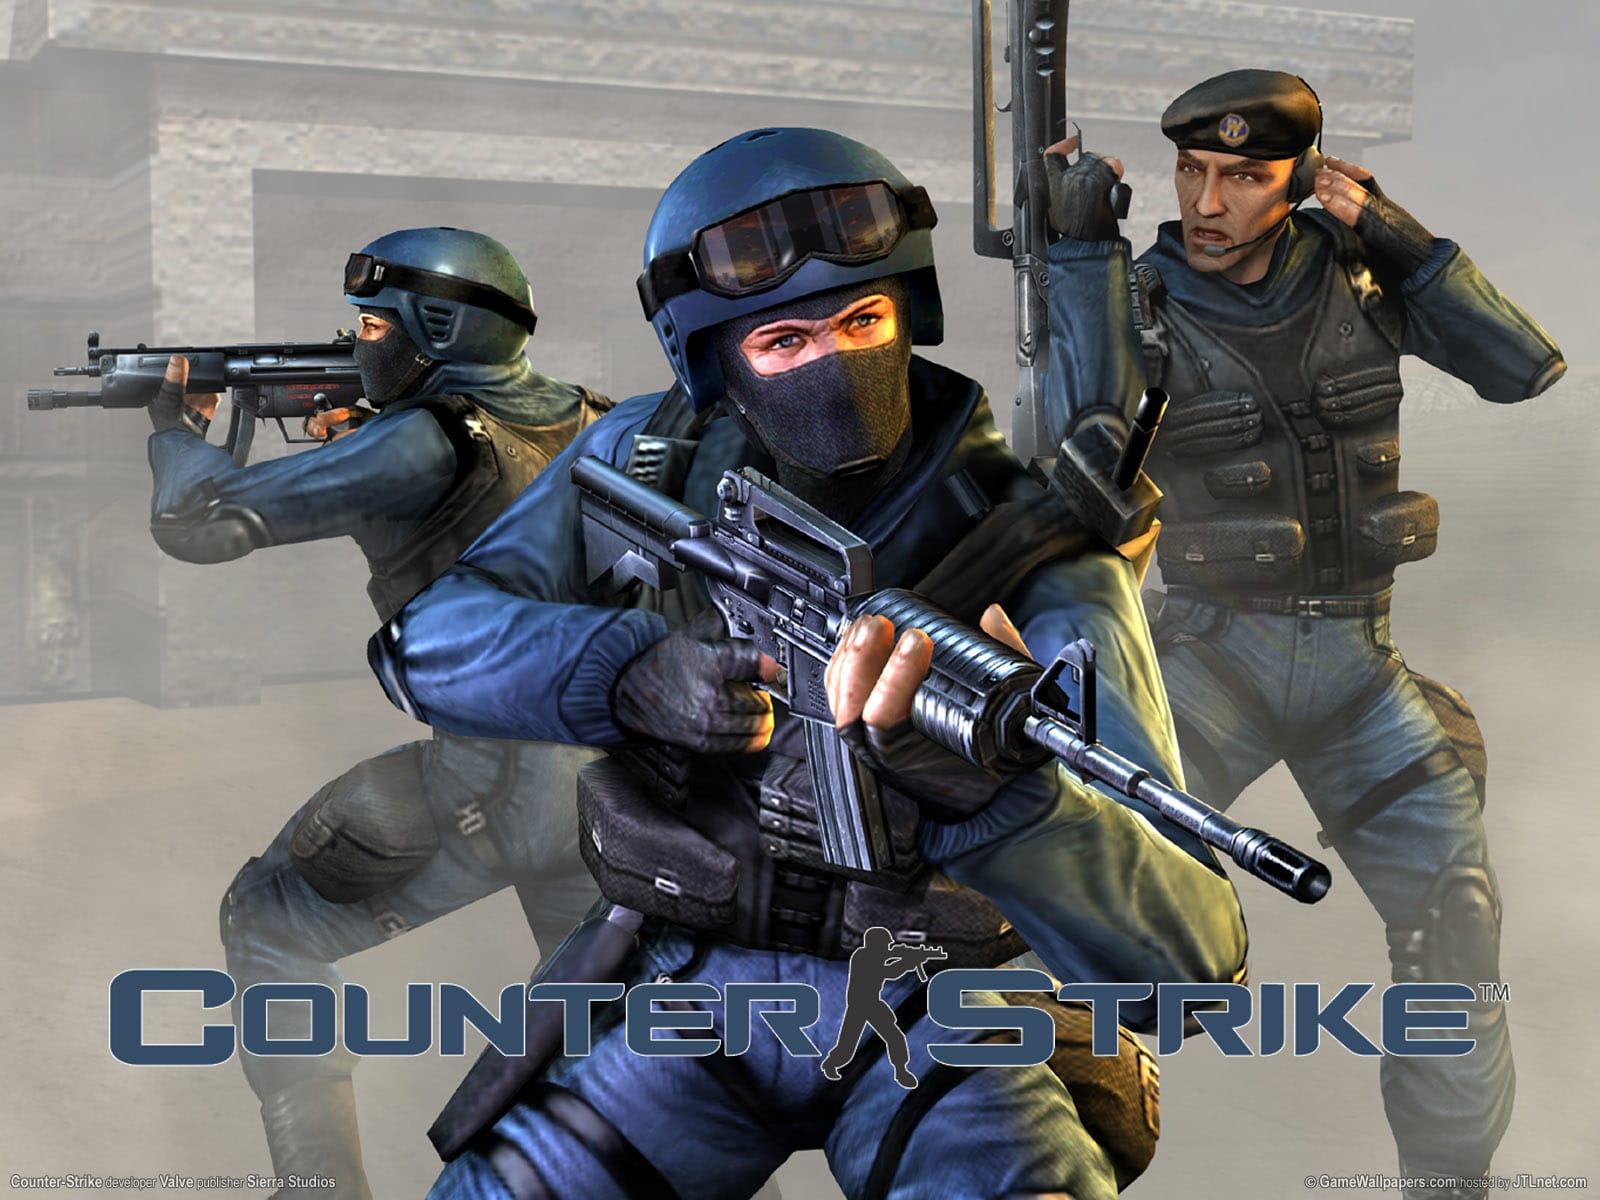 Papel de parede do Counter Strike